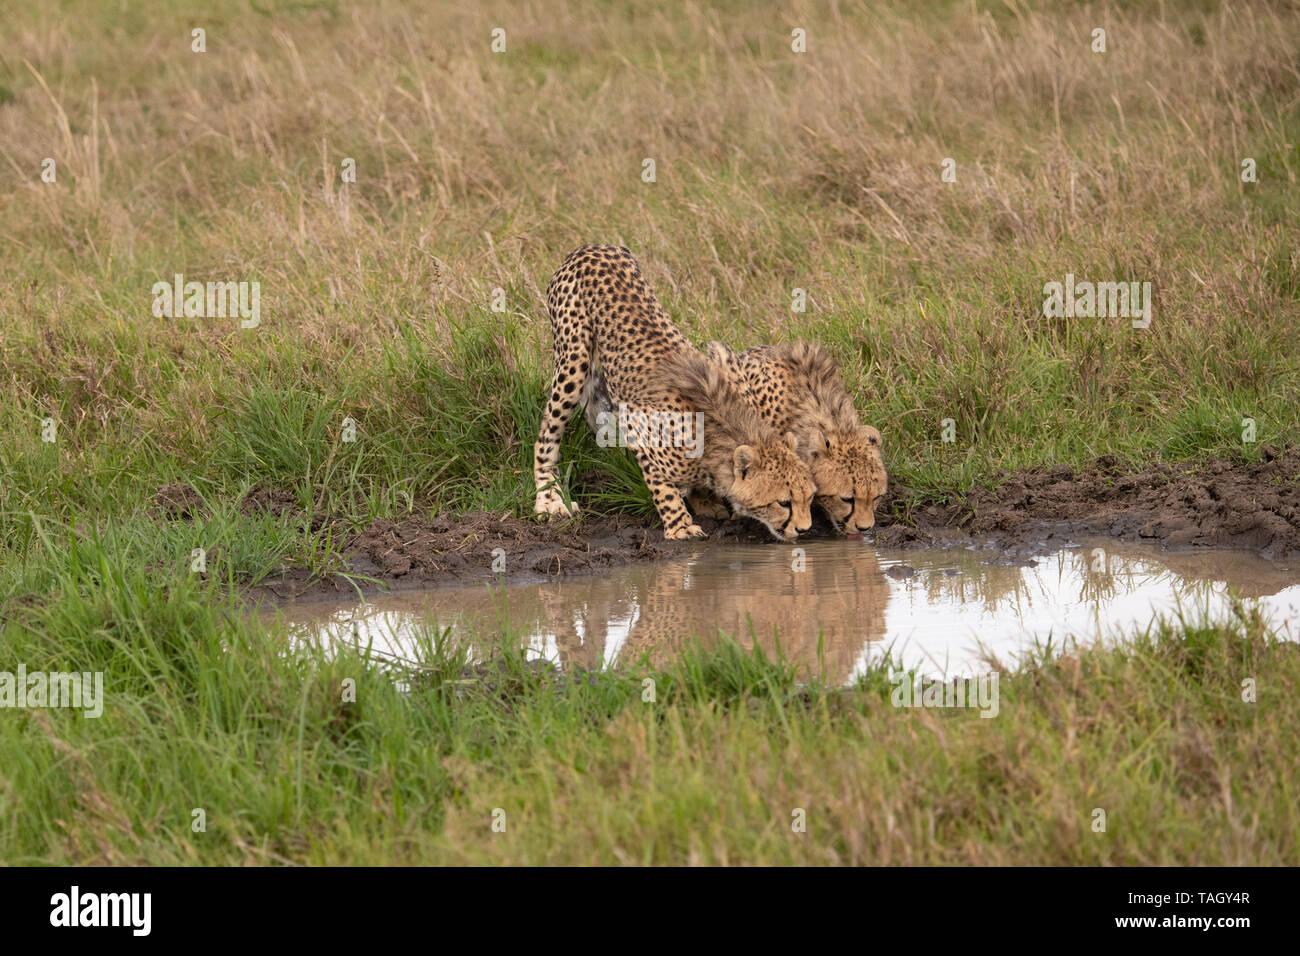 Pair of Cheetahs lapping at water hole - Stock Image